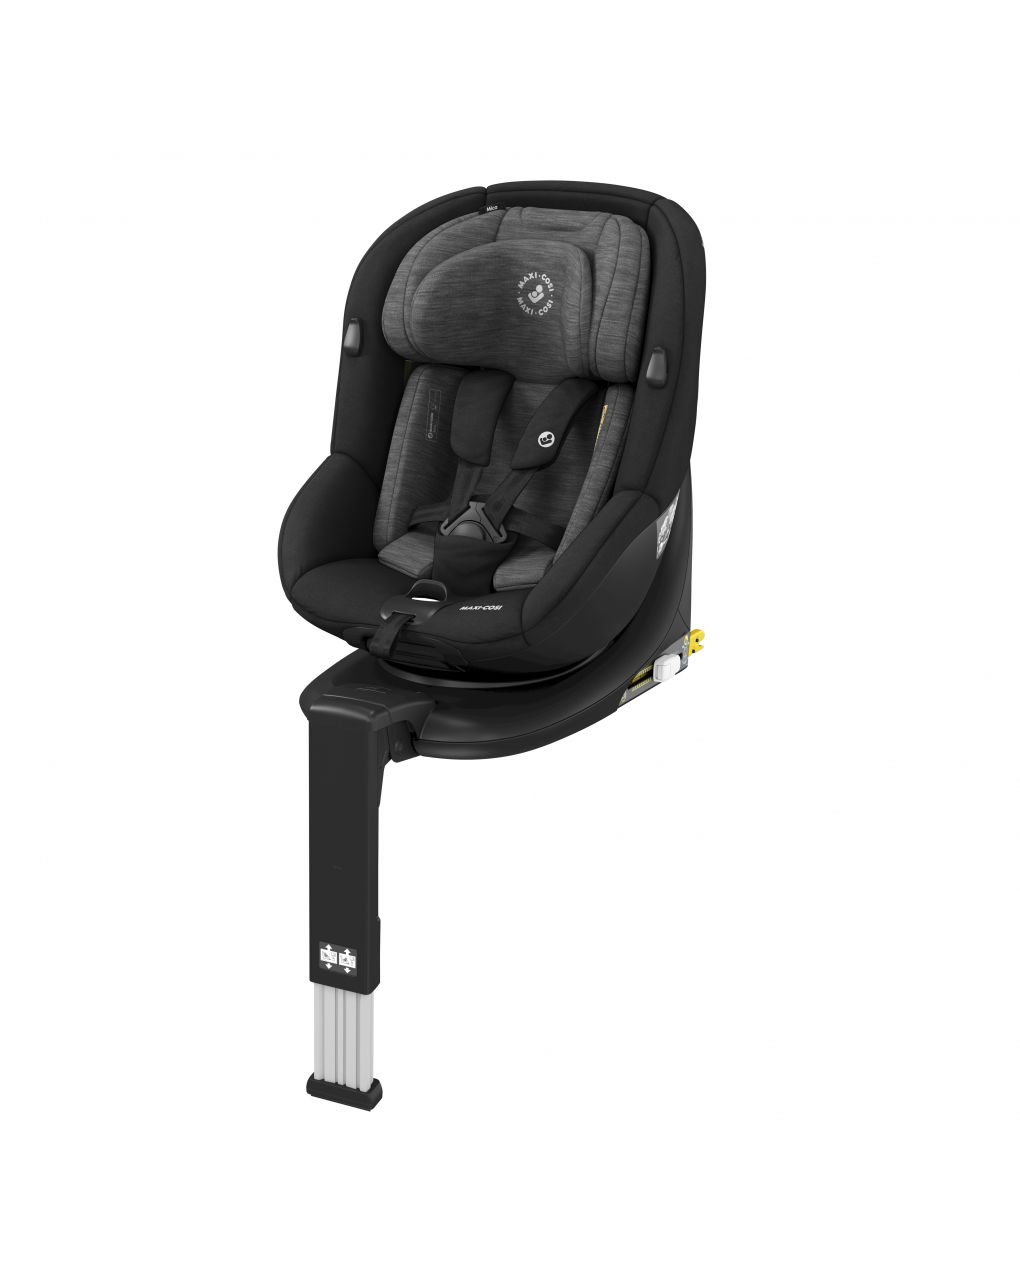 Maxi Cosi Κάθισμα Αυτοκινήτου Mica Authentic Black